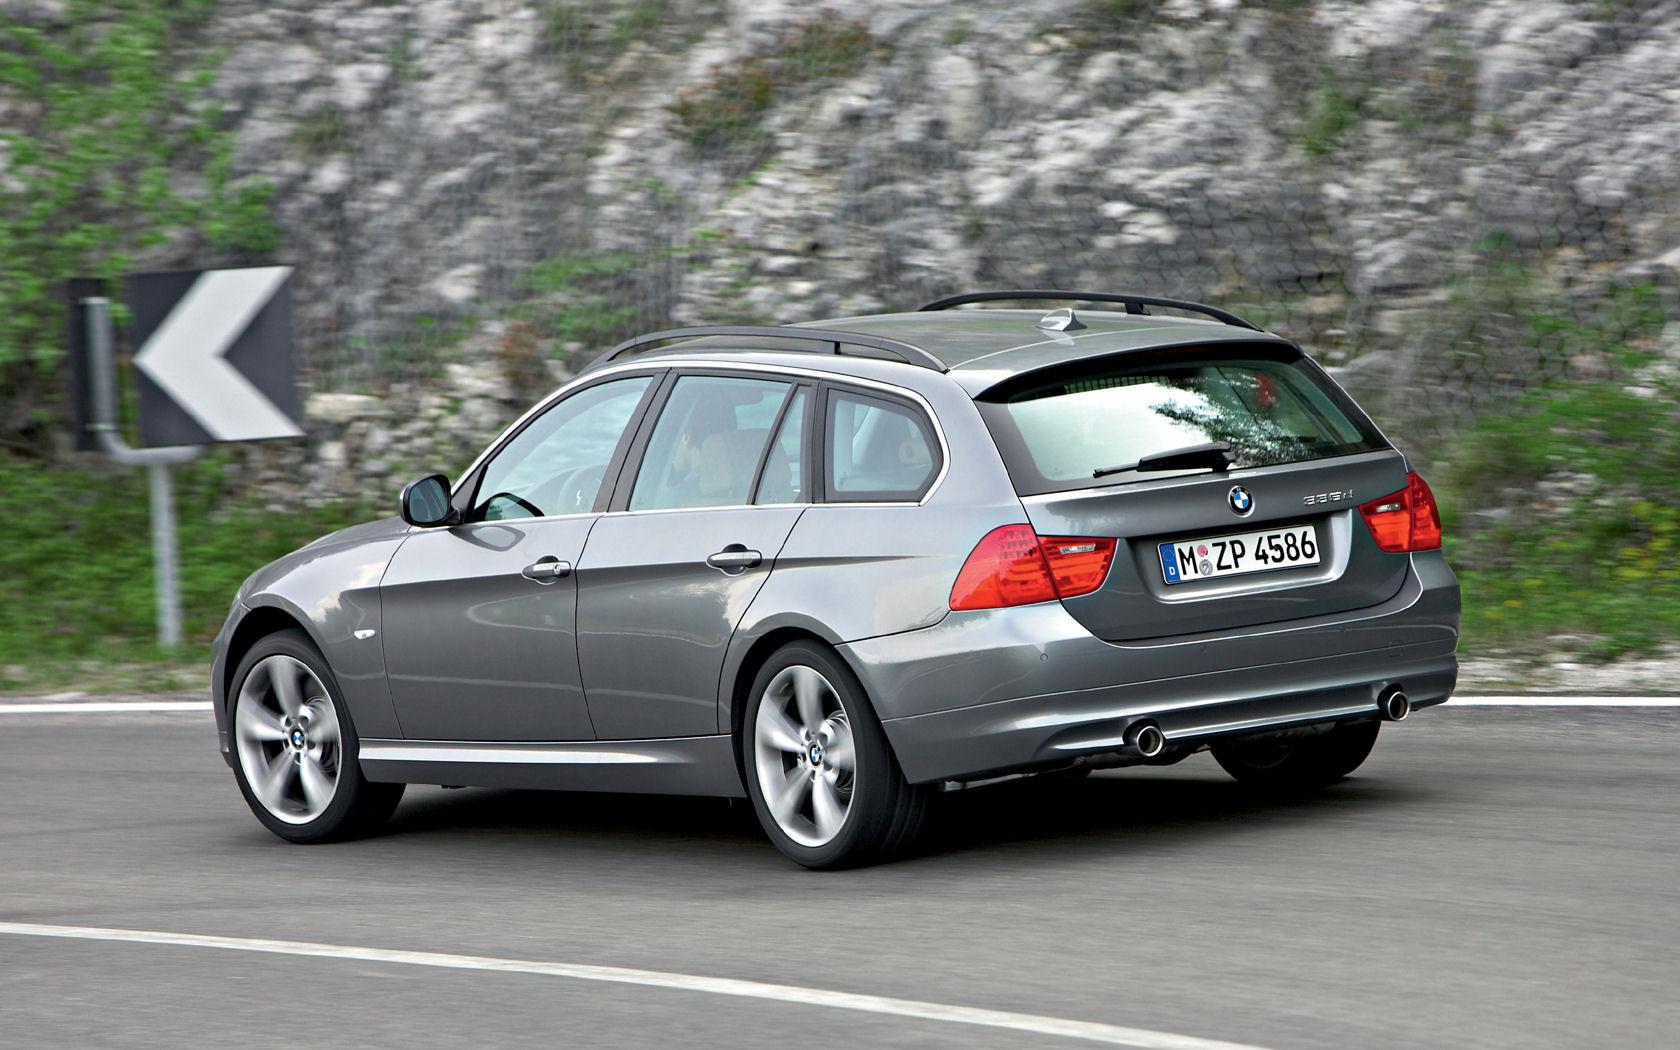 48+ BMW Wallpaper Widescreen on WallpaperSafari